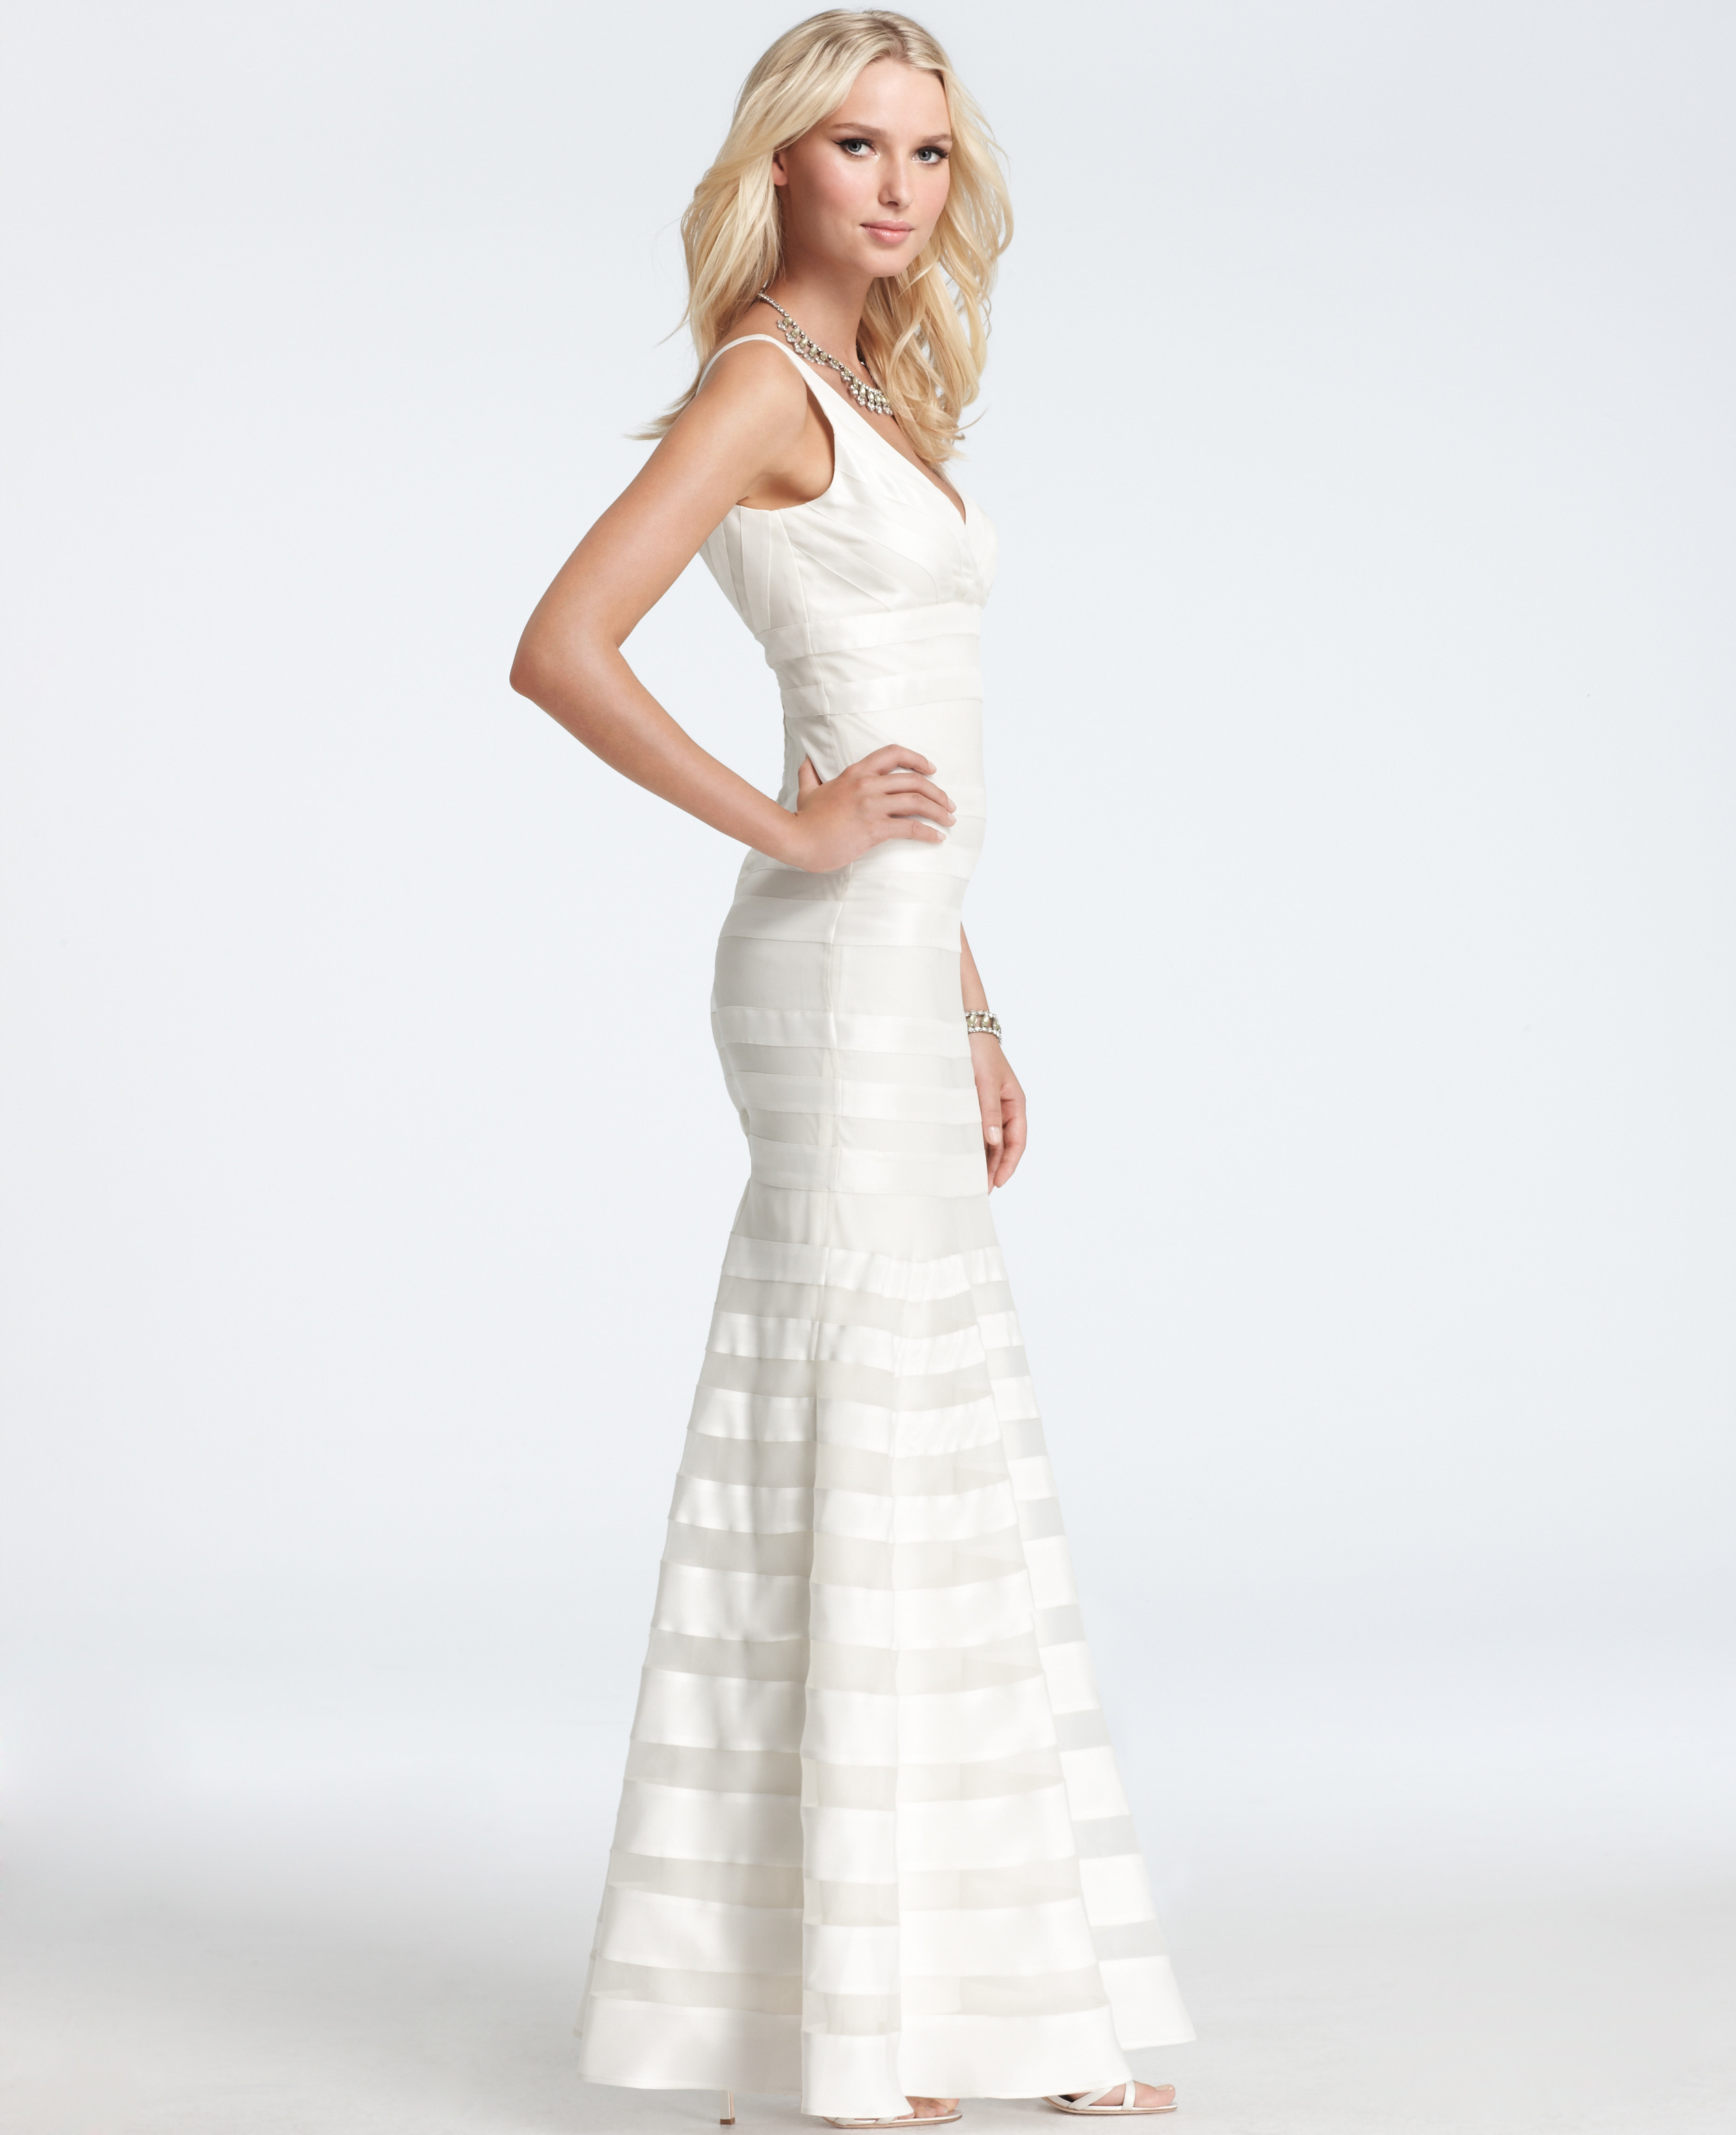 Ann taylor silk georgette mermaid wedding dress in white for Ann taylor dresses wedding